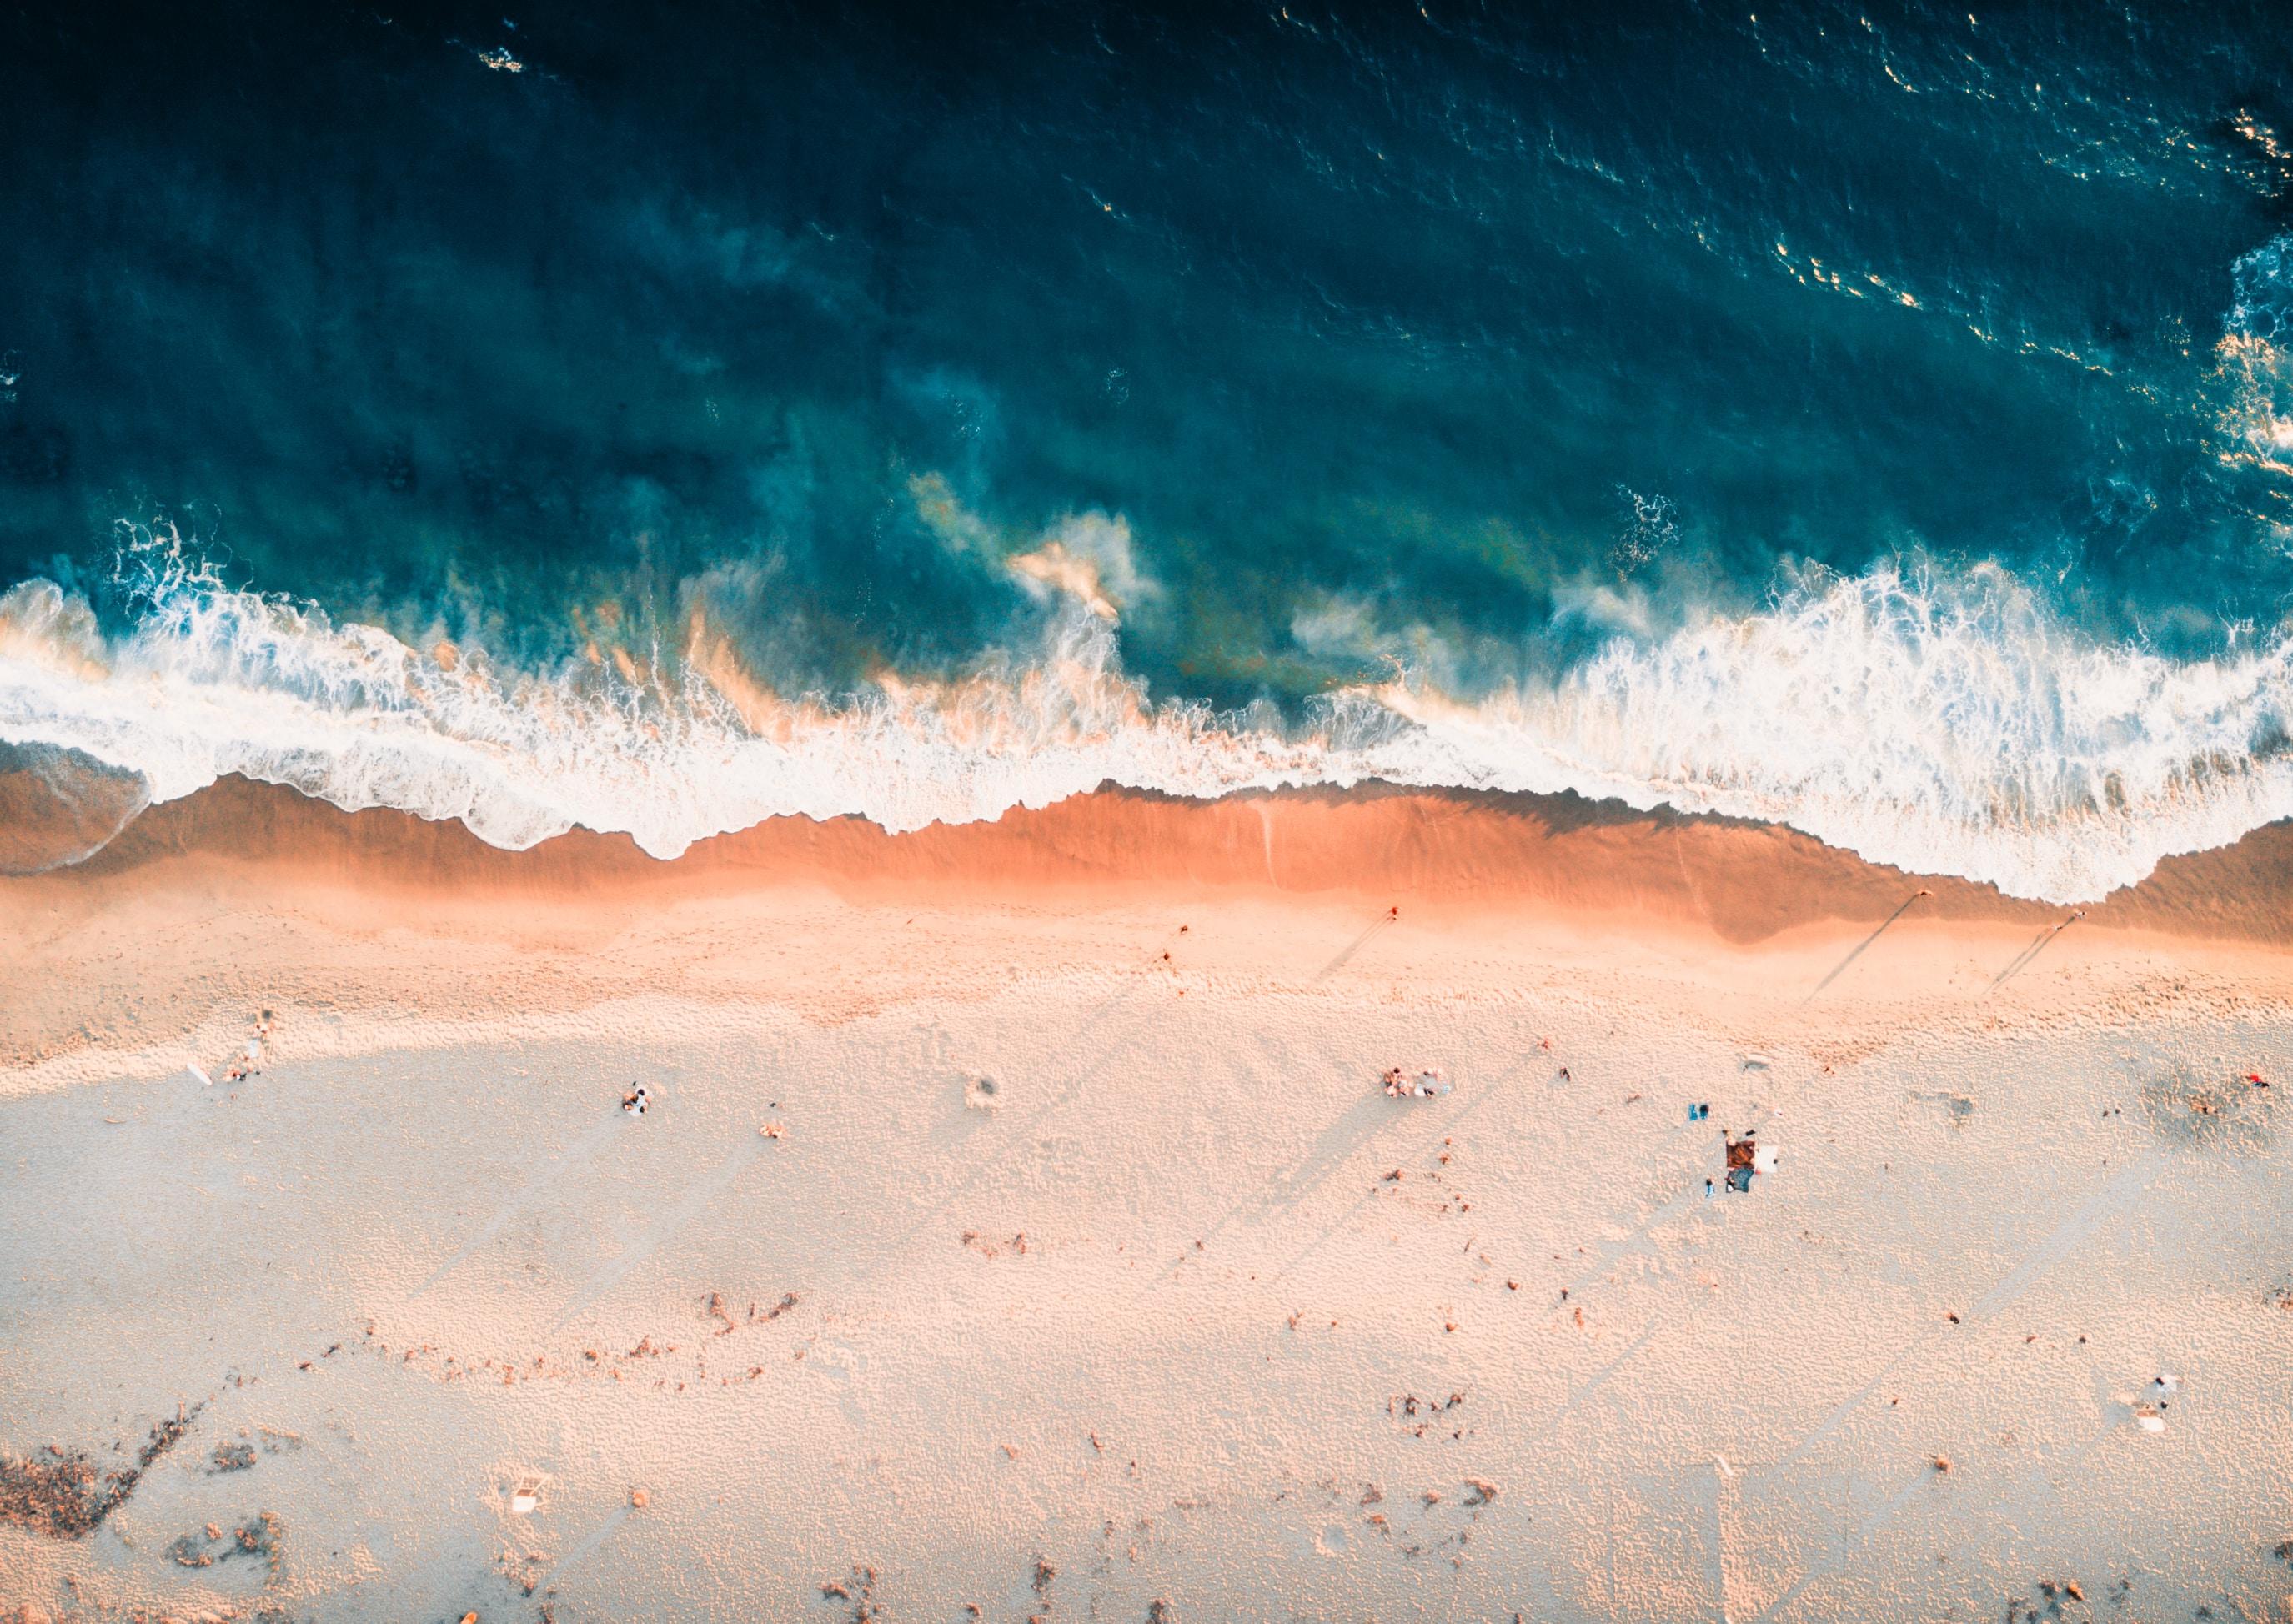 Drone view of the waves splashing on the Laguna Beach sand coastline